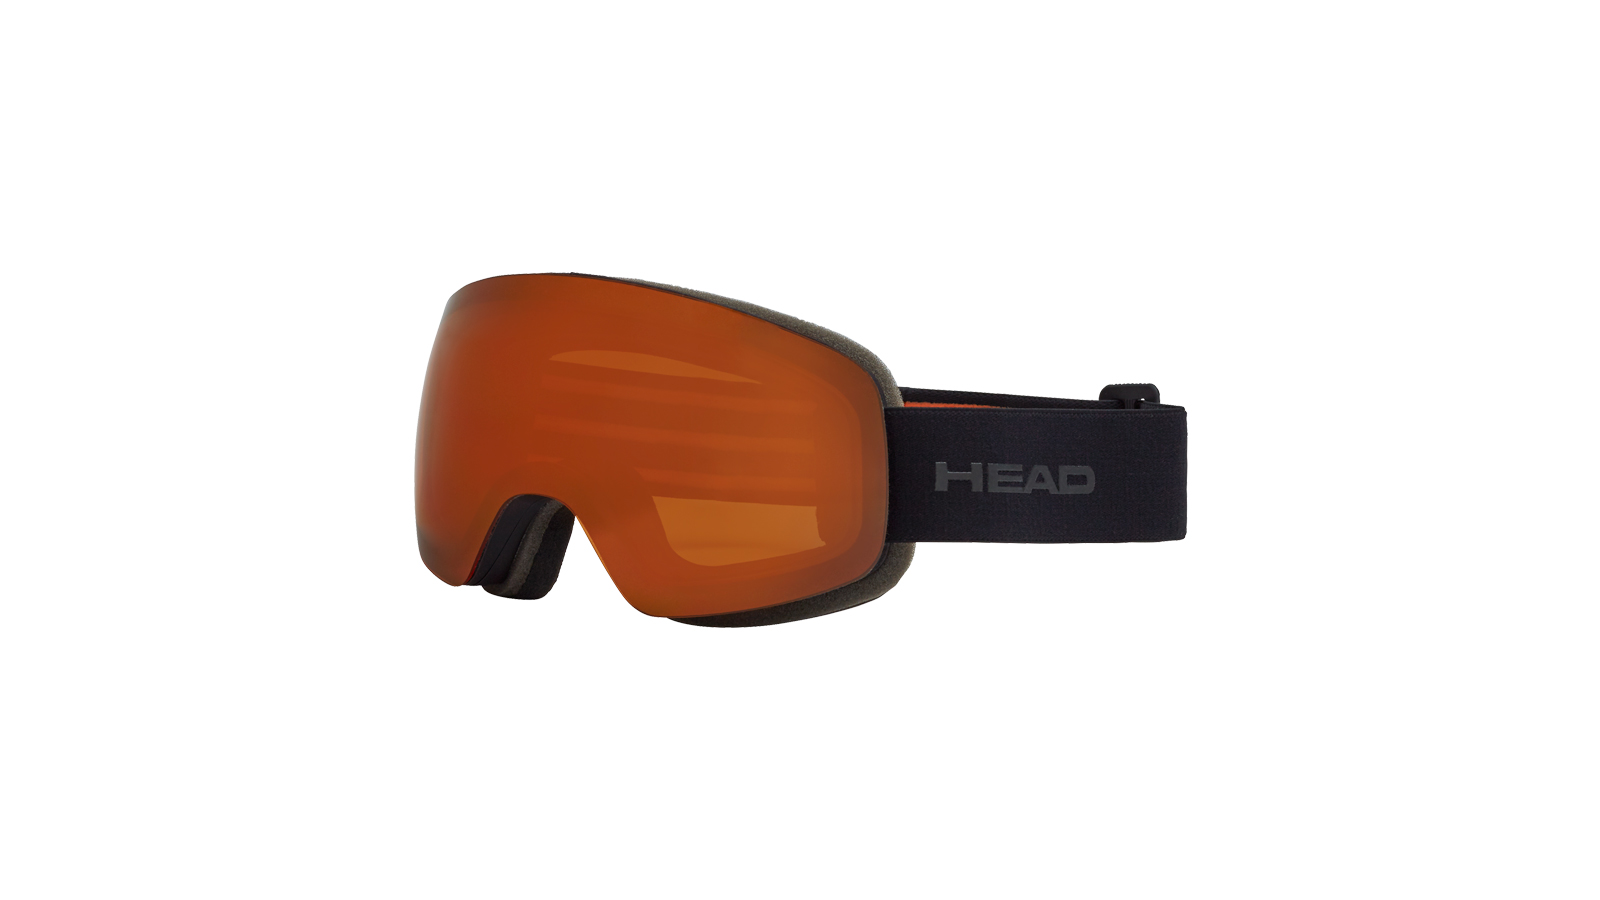 Head-Globe-goggle